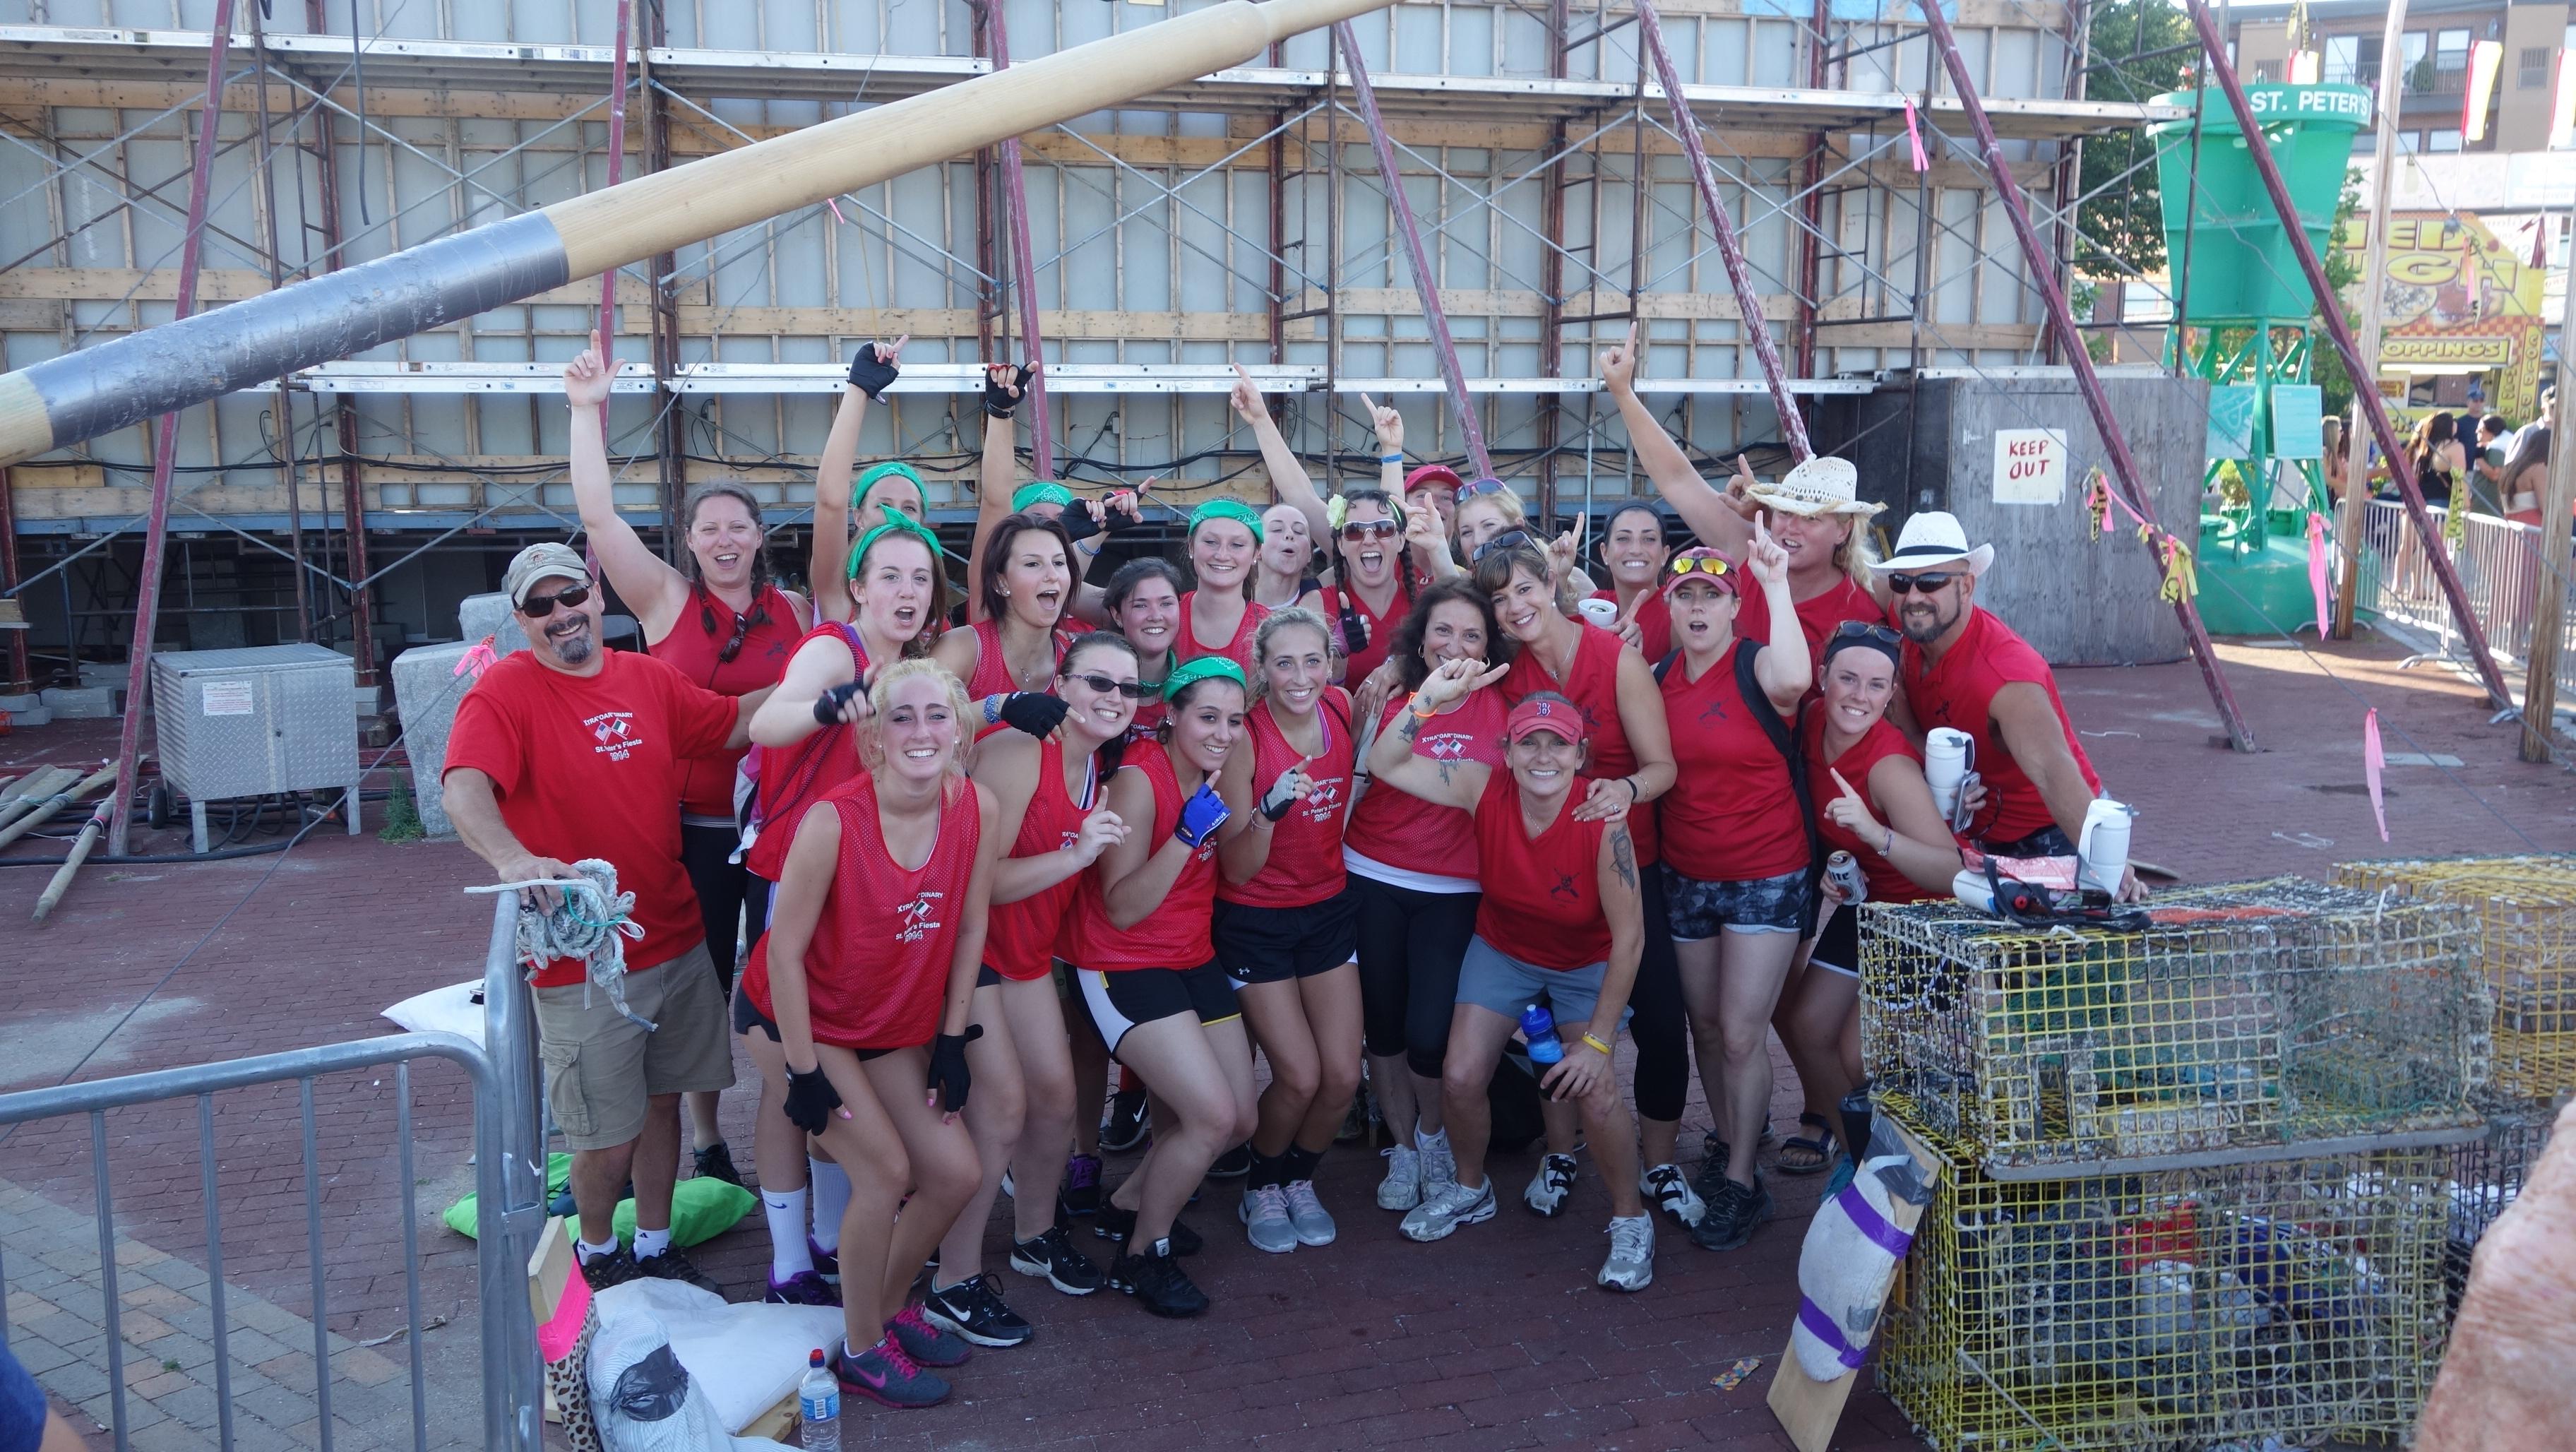 Amanda Race St. Peter's Fiesta 2014 Camps! 339